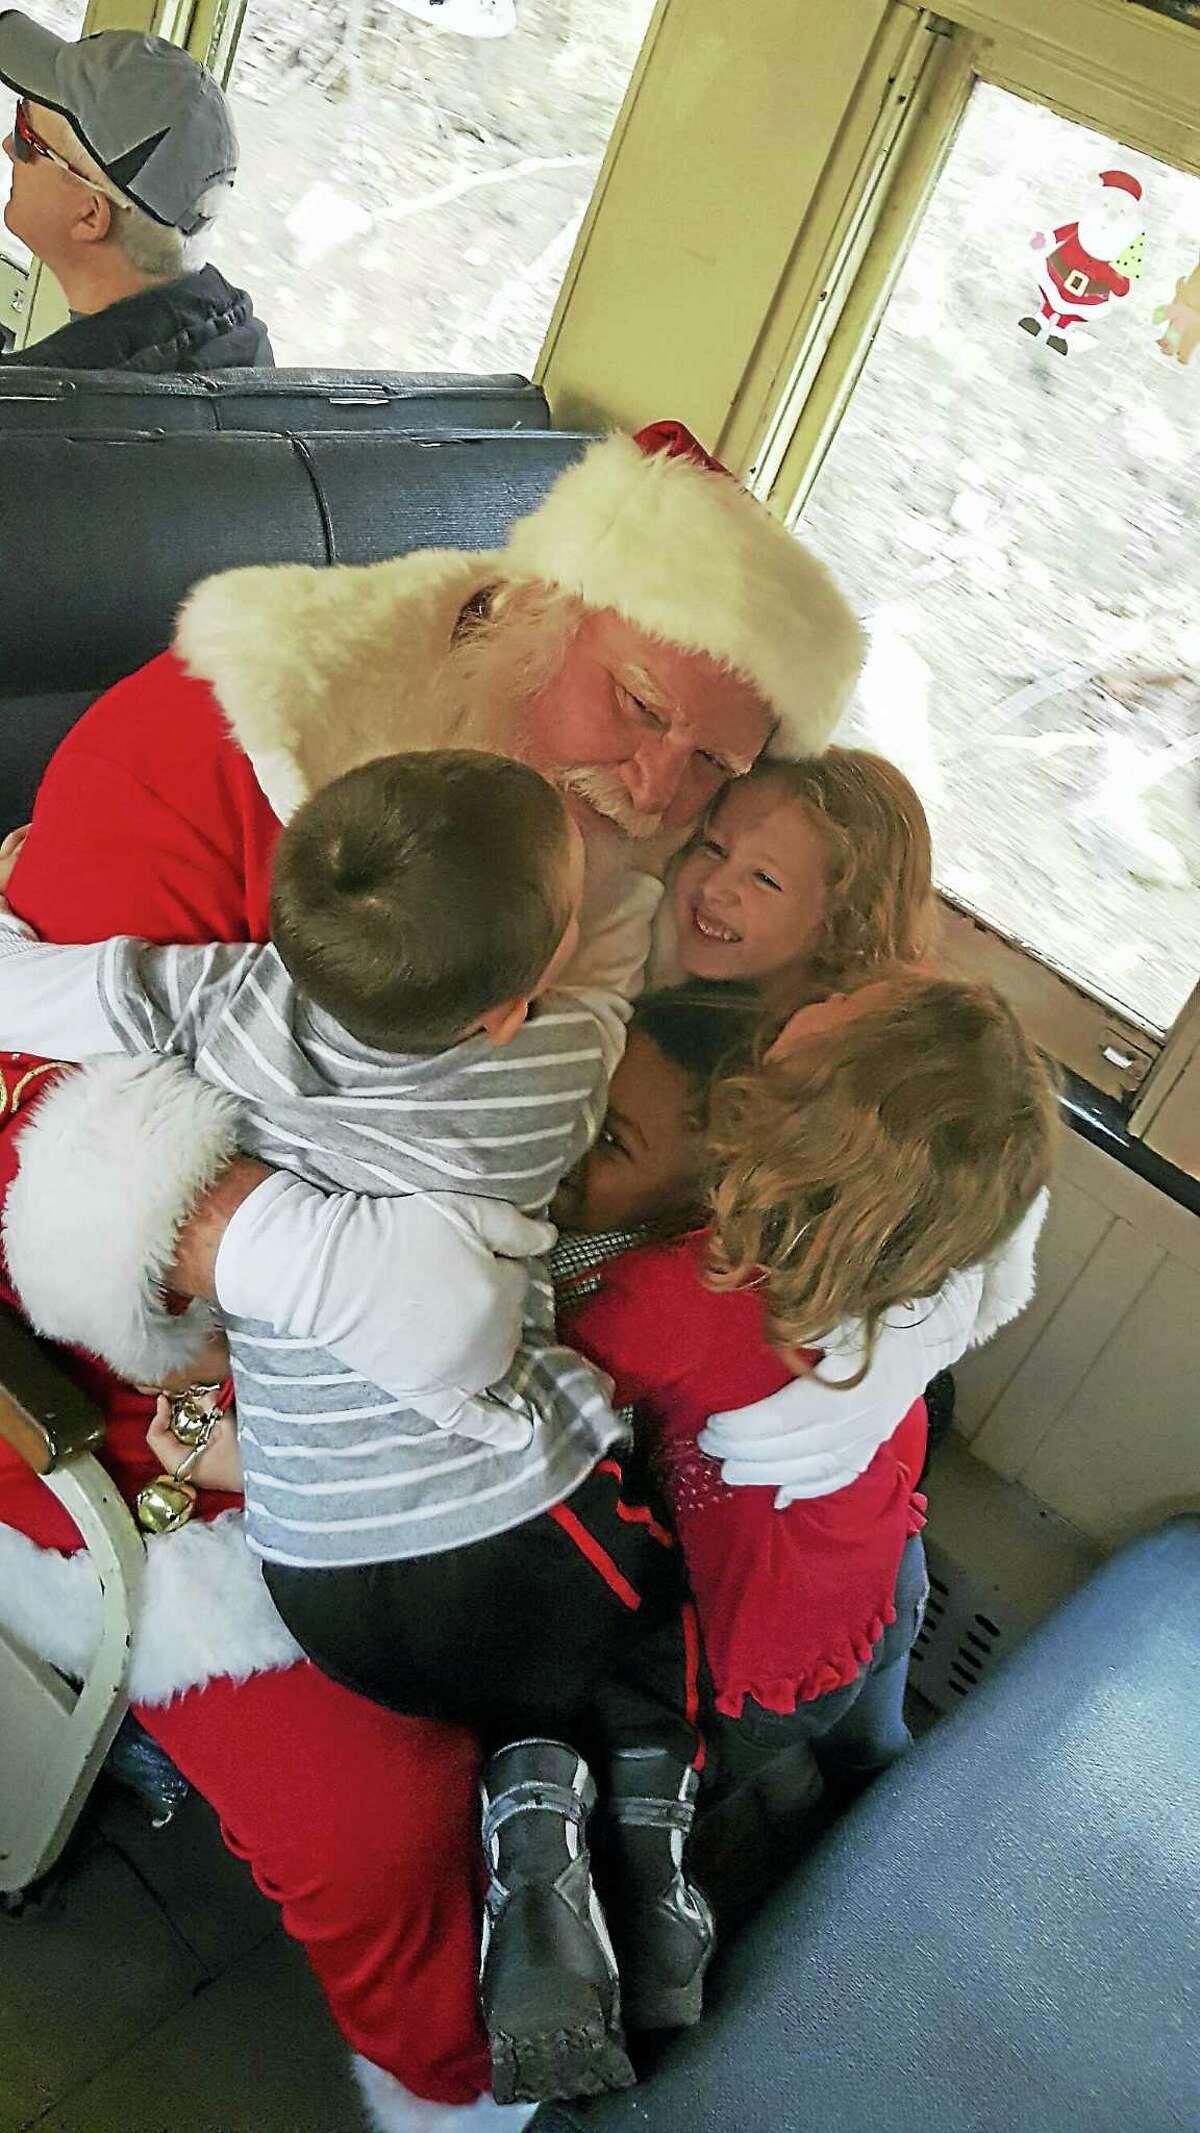 Photos by Heather StamppChildren hug Santa Claus during their train ride.